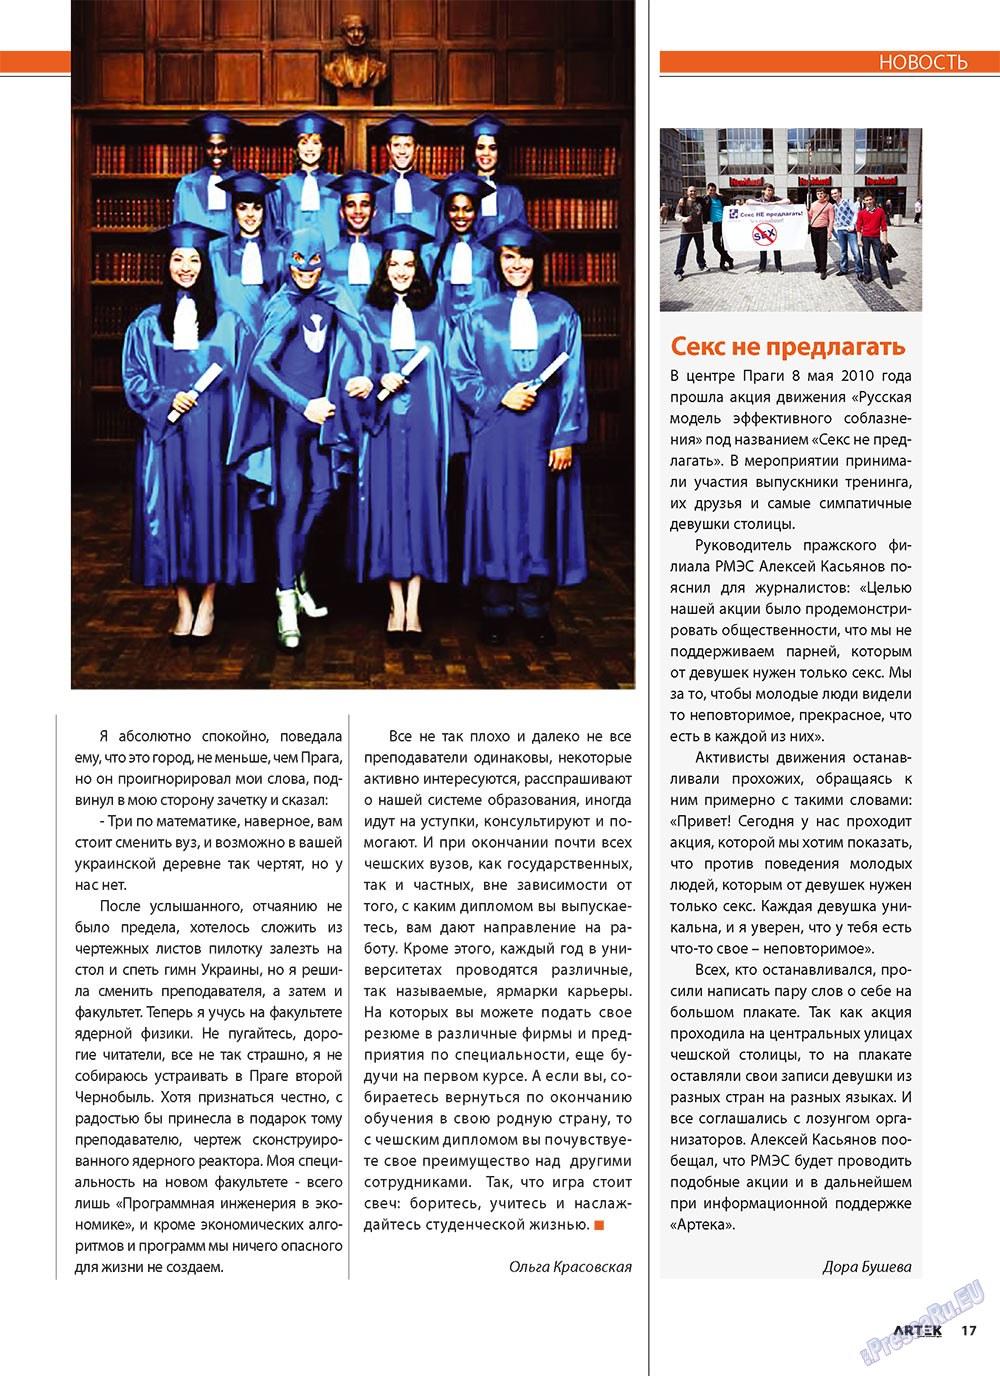 Артек (журнал). 2010 год, номер 3, стр. 19